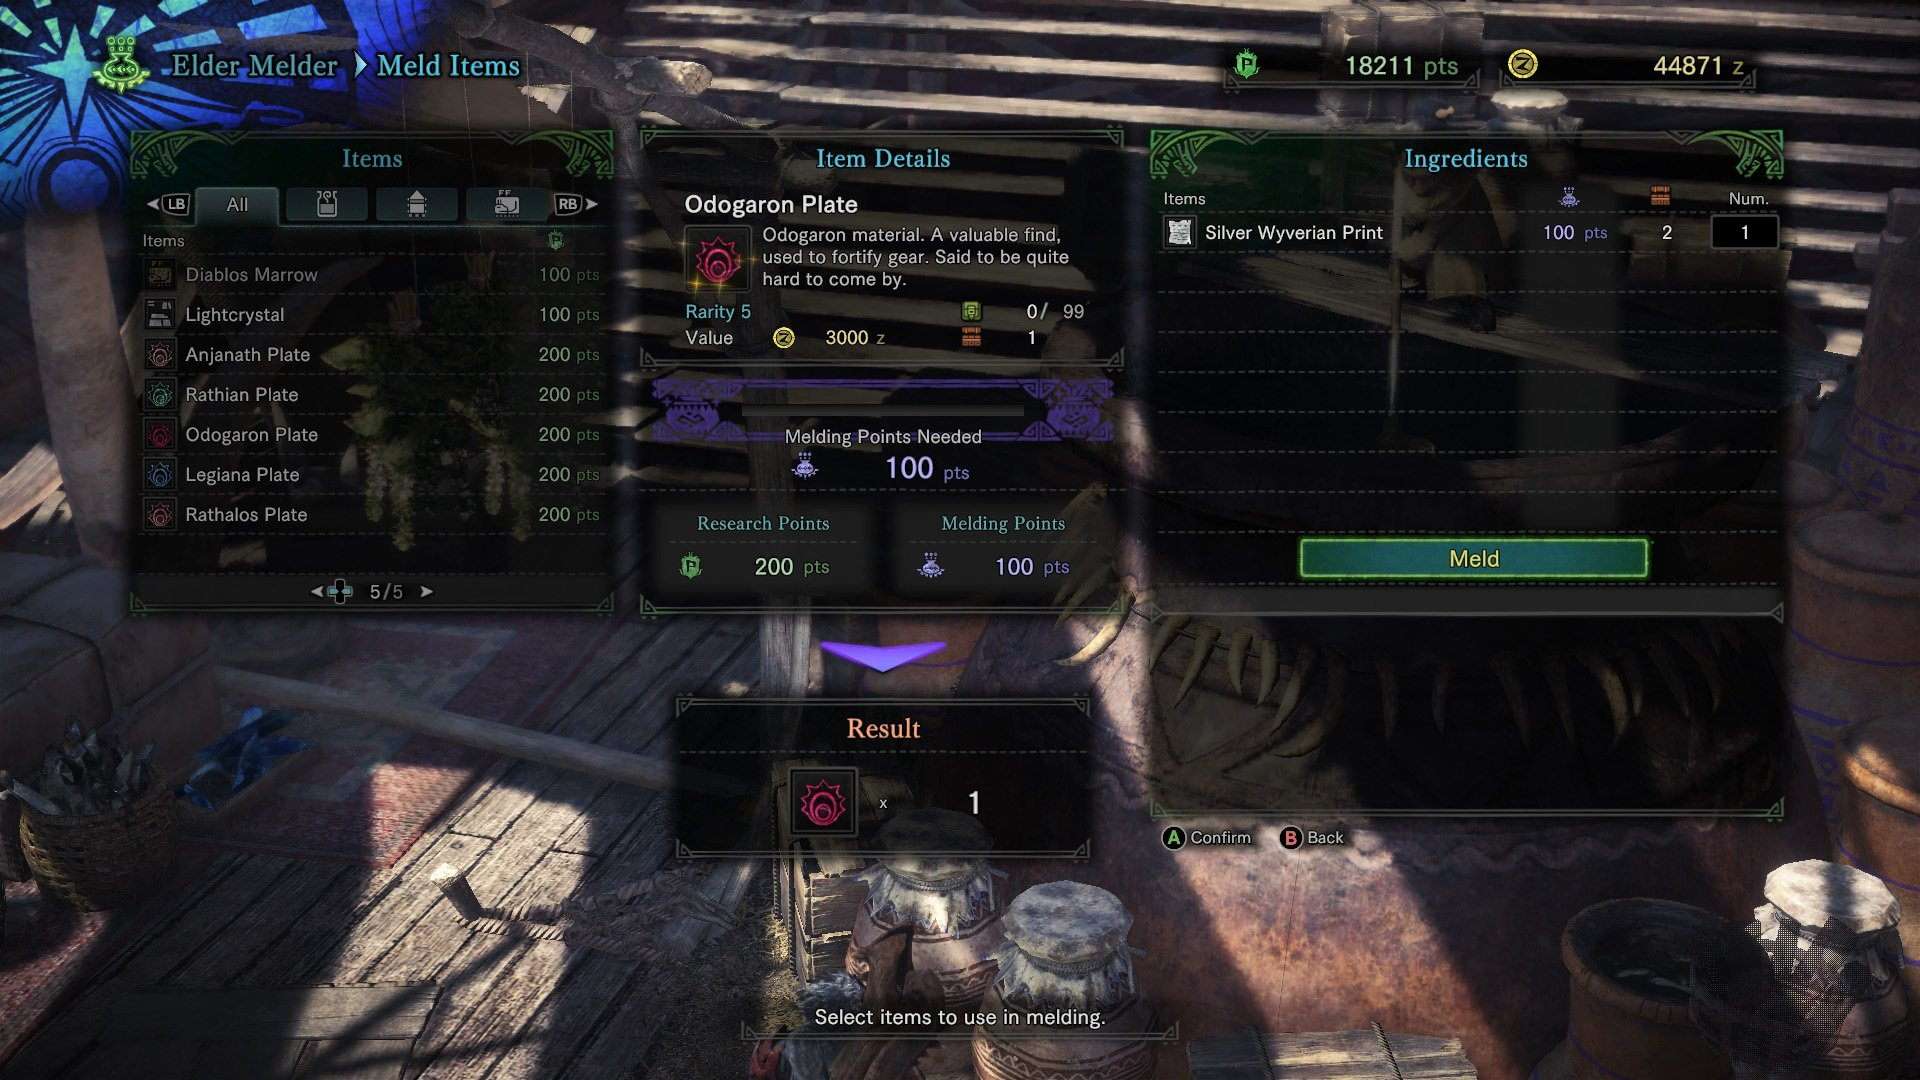 monster hunter world melding pot research points